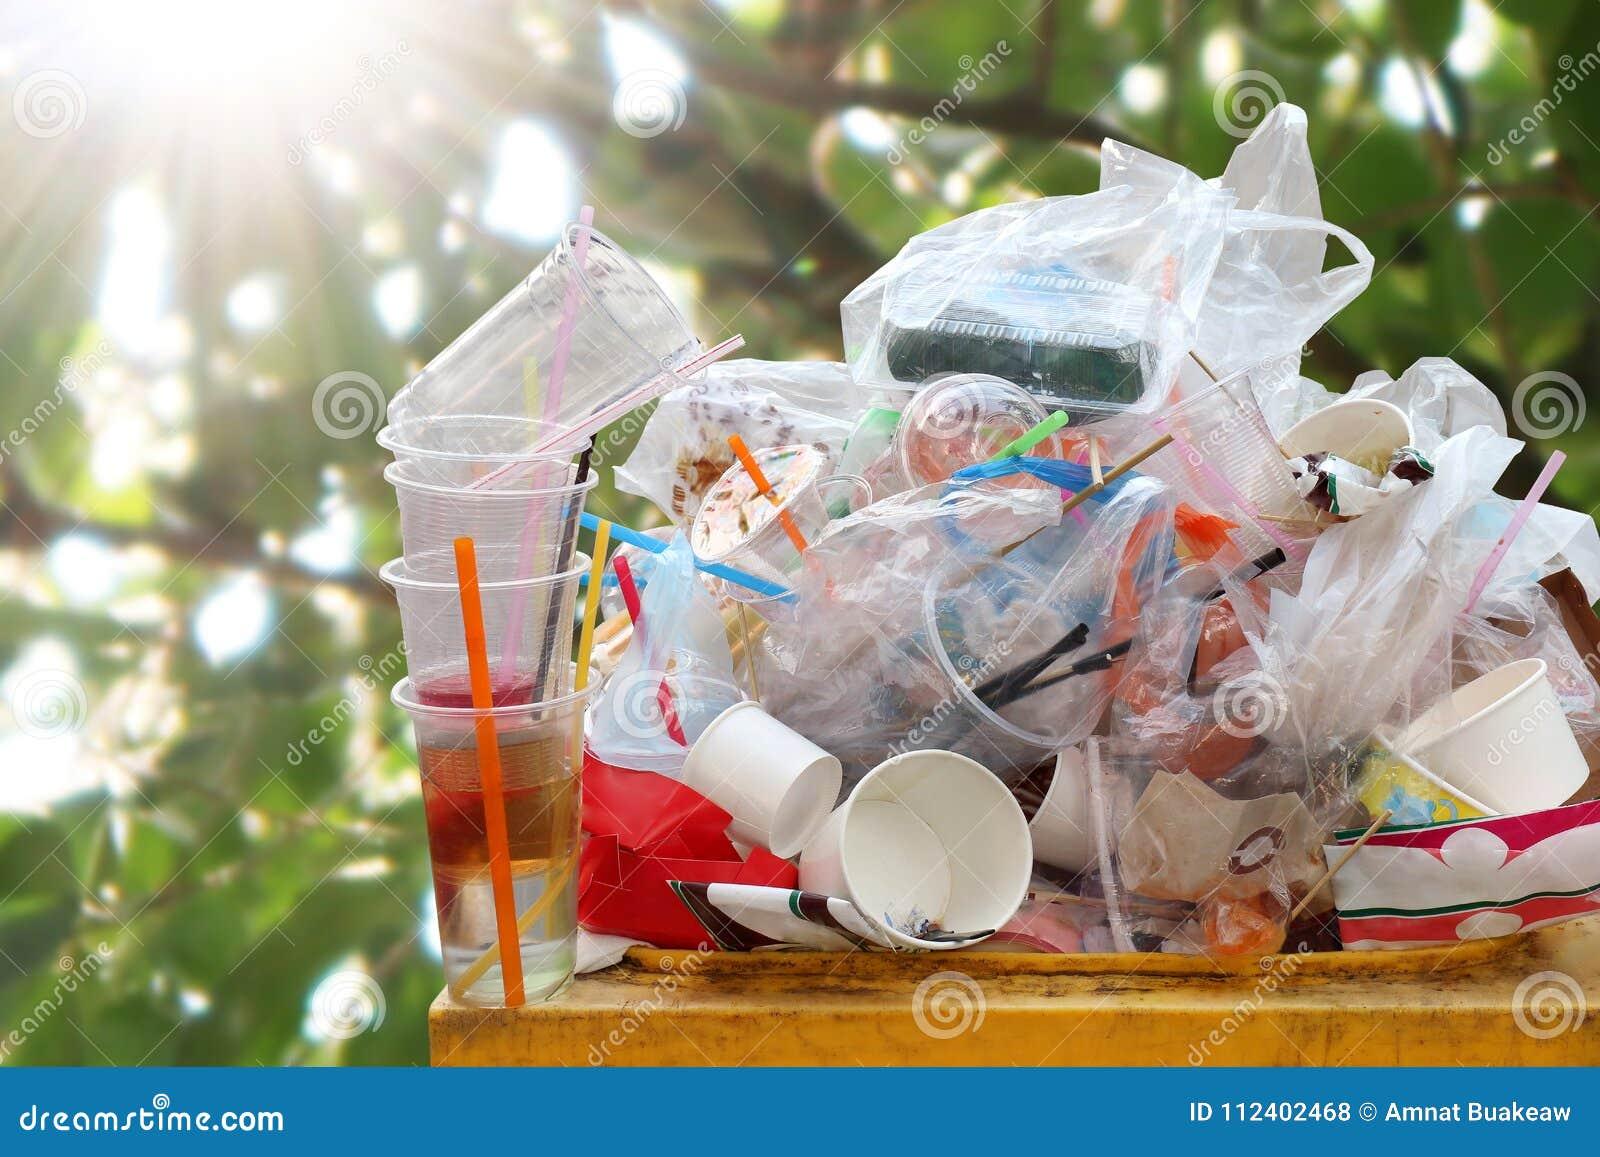 Lixo muito close-up no lixo completamente do escaninho de lixo, lotes waste do saco de plástico da sucata no fundo da luz do sol